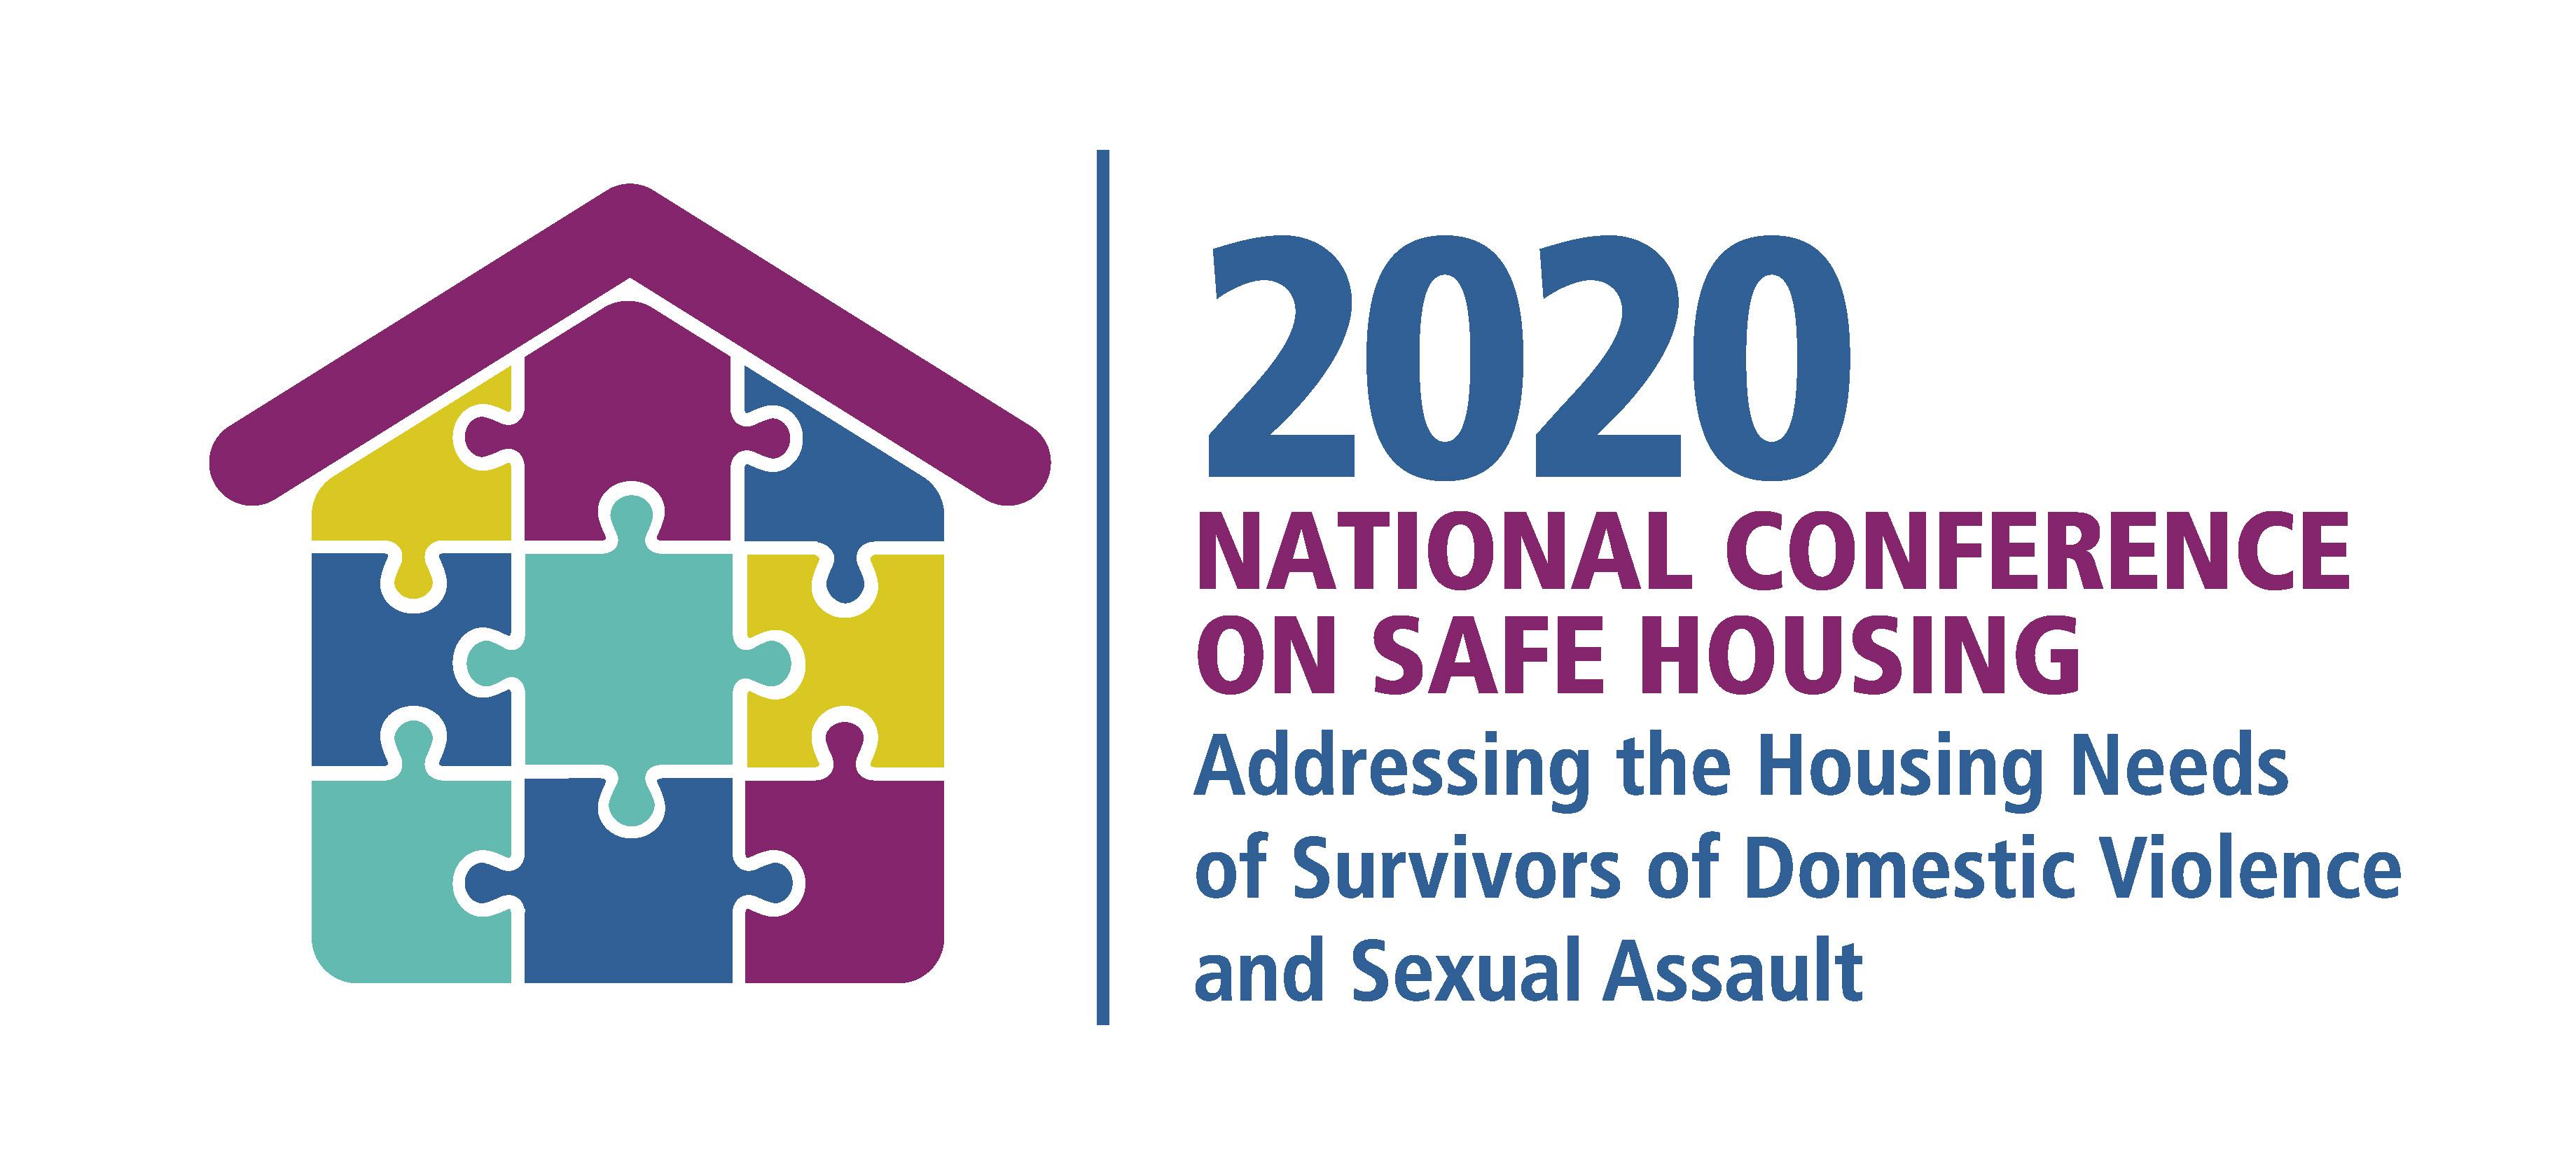 2020 National Conference on Safe Housing